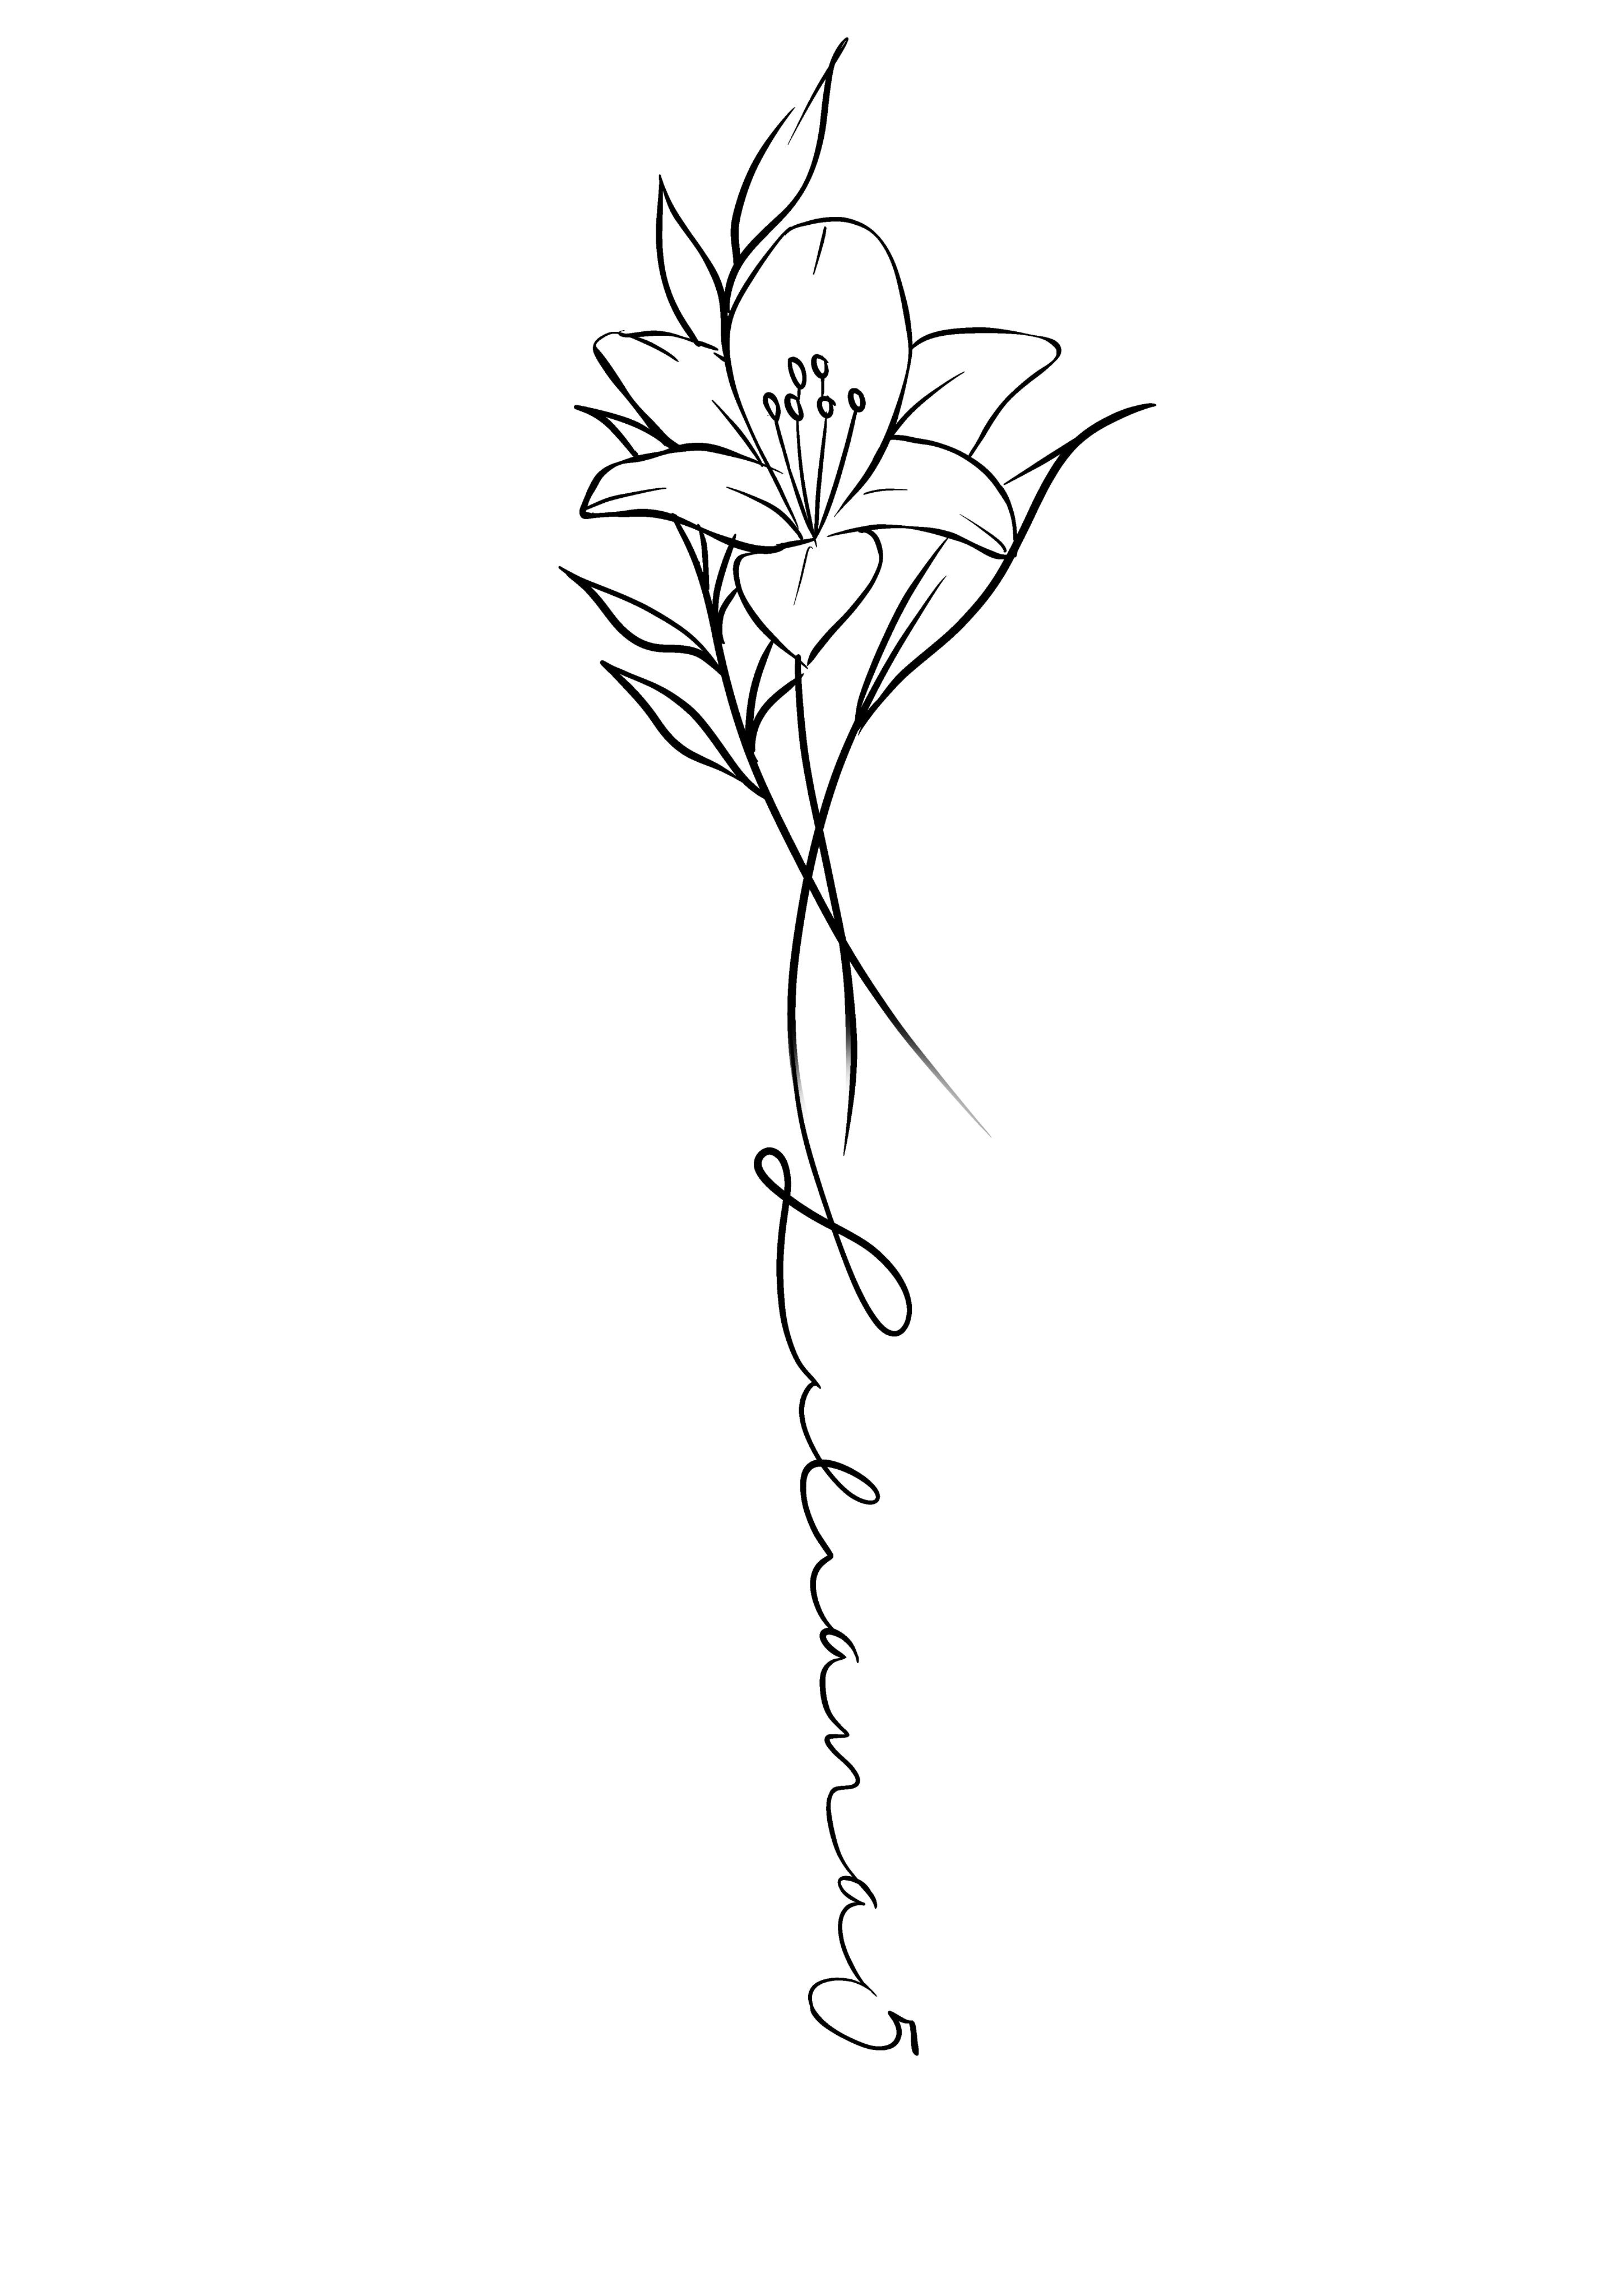 Pin By Neda Falahshojaei On Lotus Flower Tattoo Lotus Flower Tattoo Lotus Flower Tattoo Design Flower Tattoo Designs